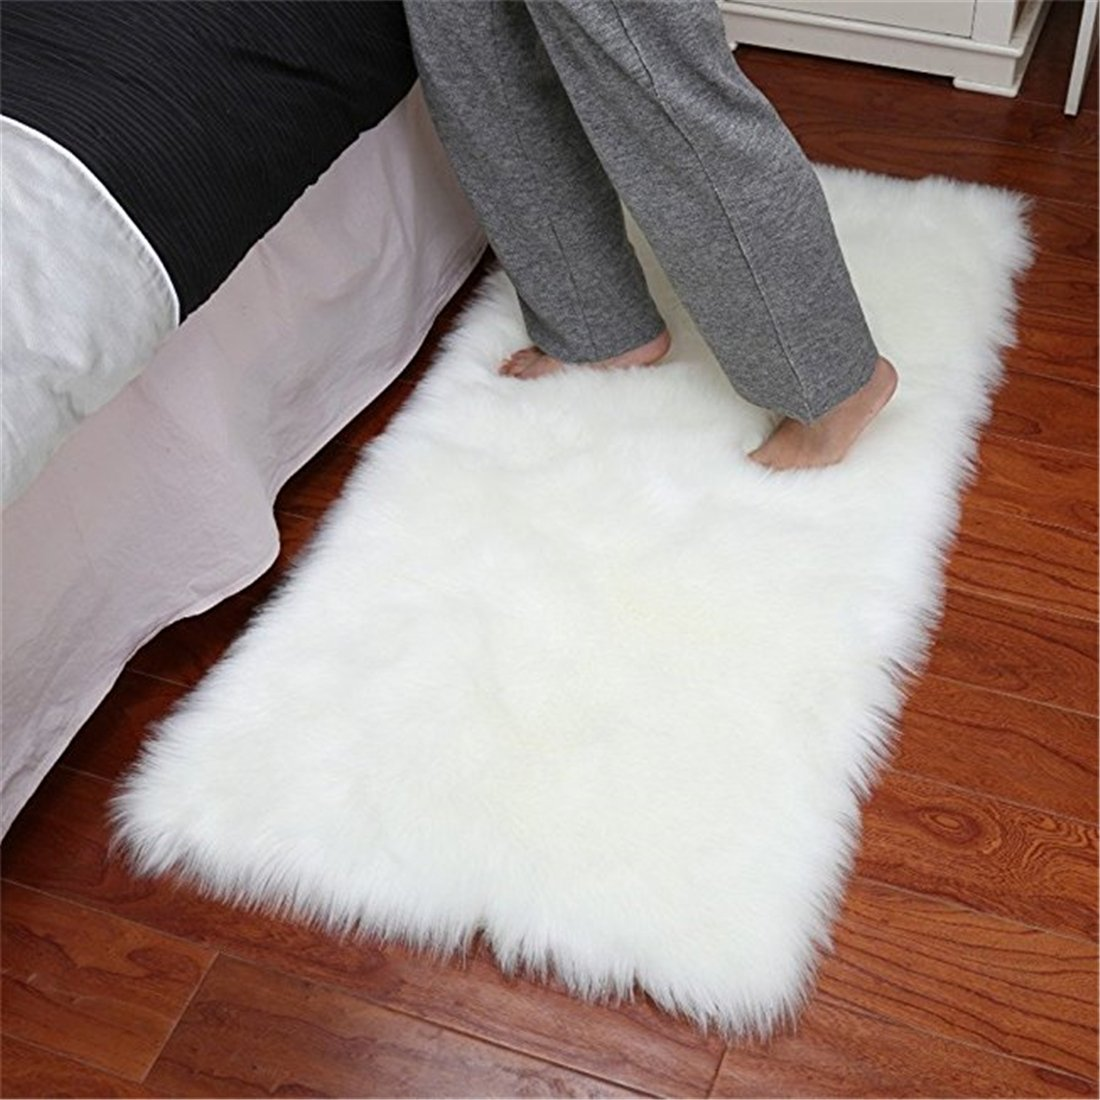 FurFurug Faux Silky Deluxe Sheepskin Area Shag Rug Children Play Carpet